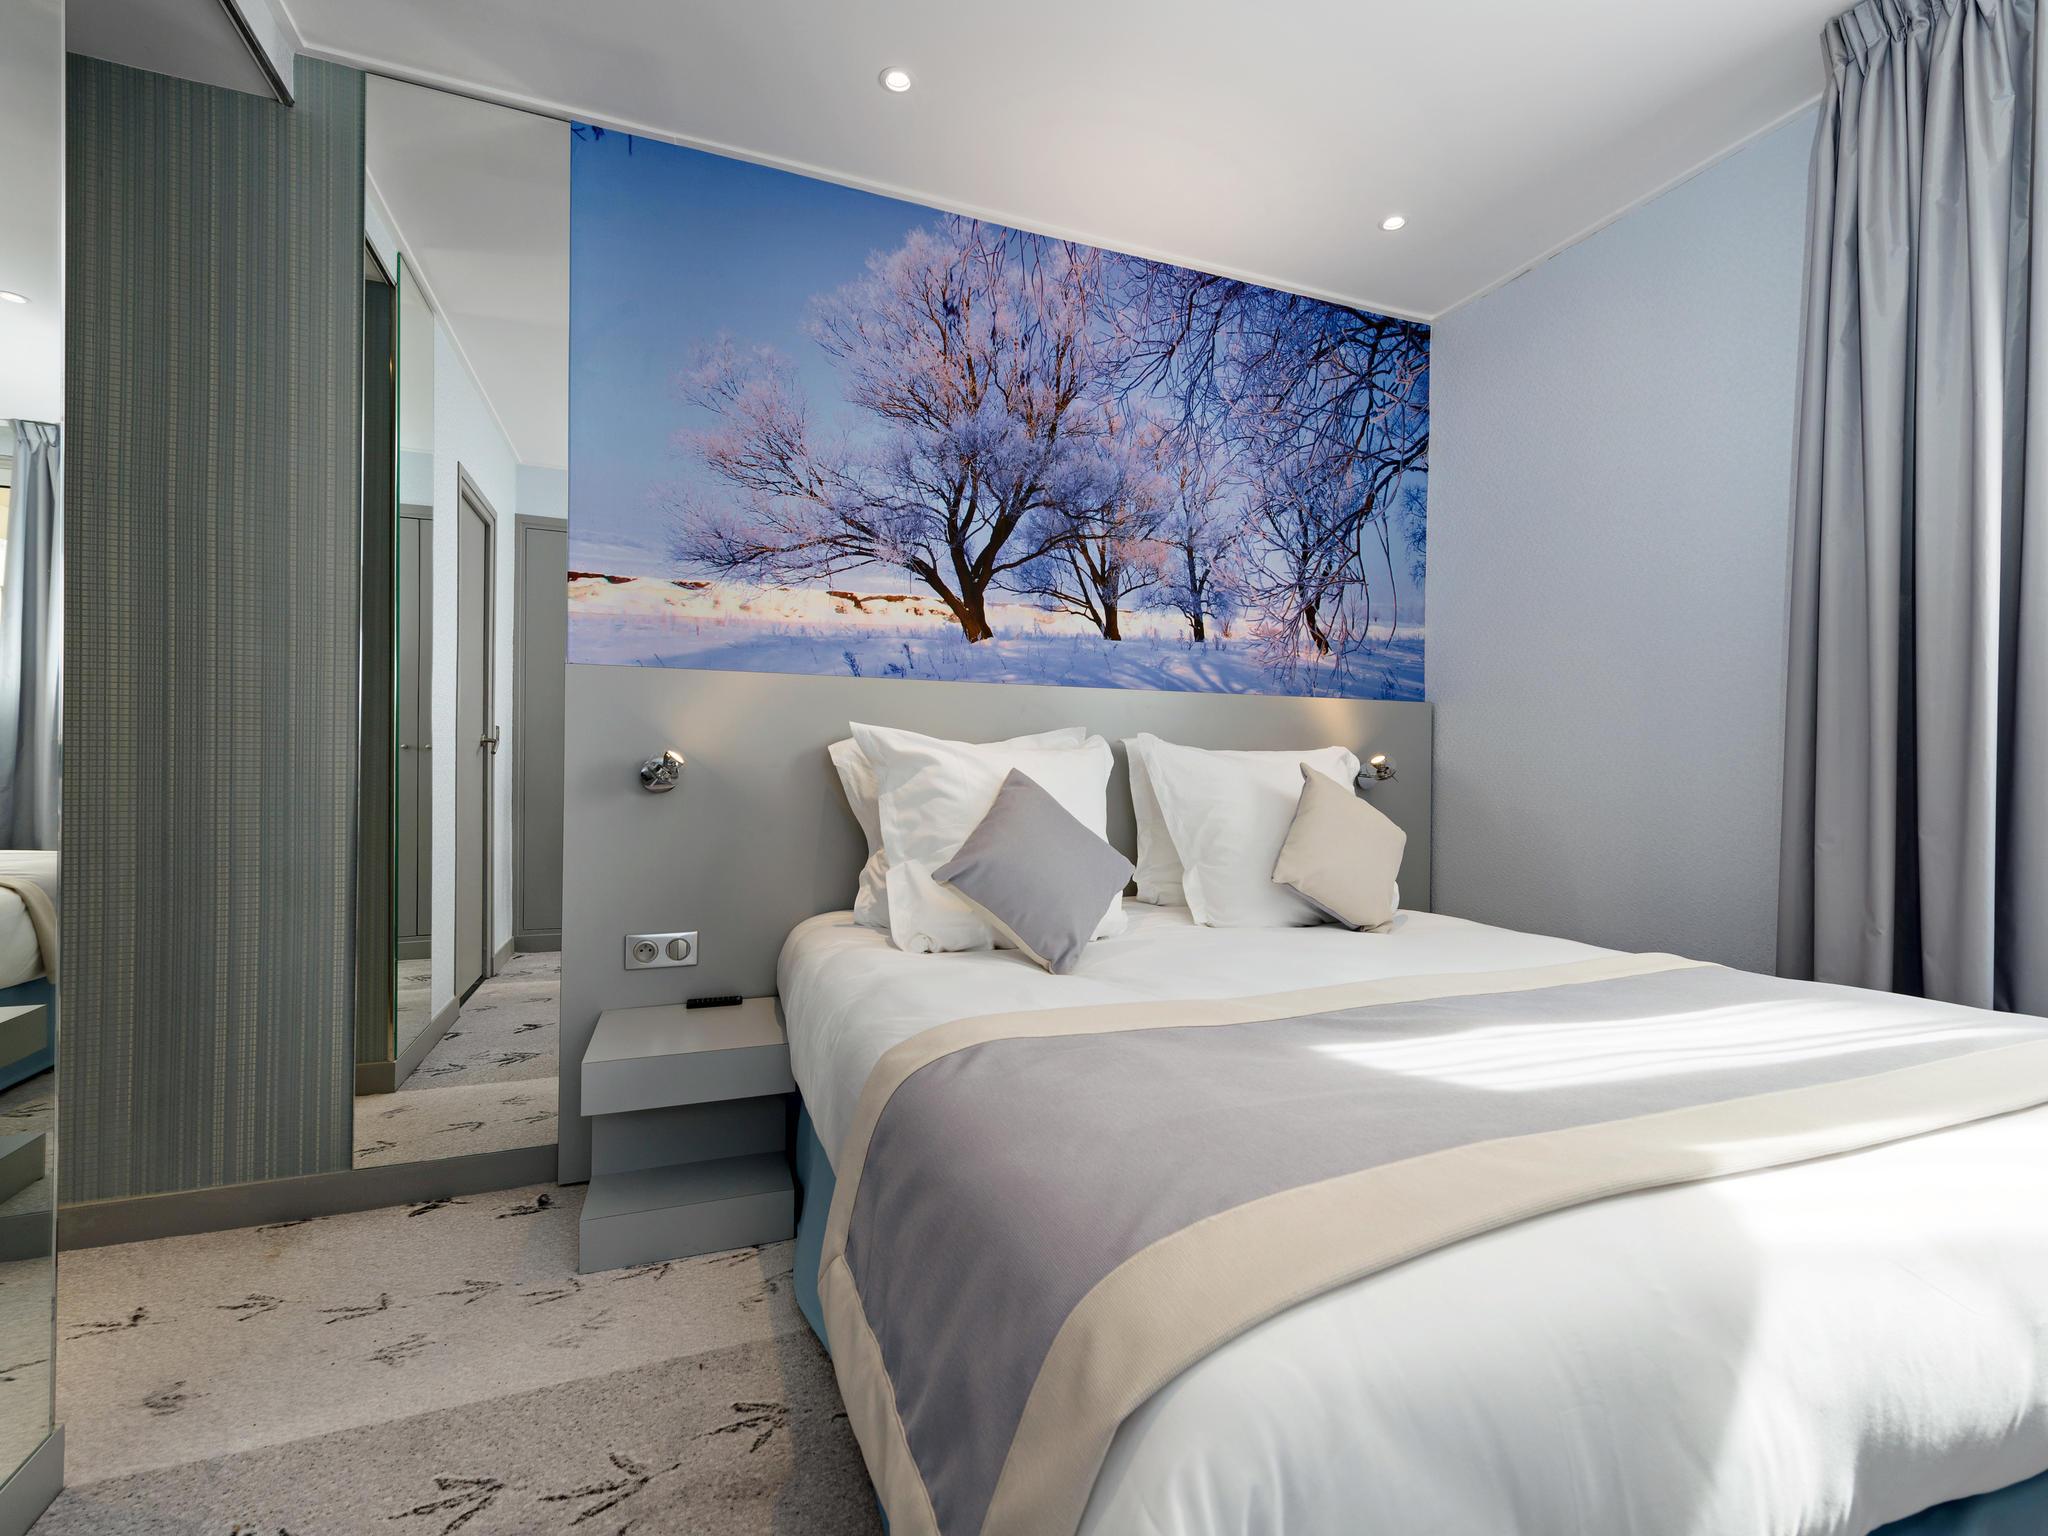 Hotel in PARIS Les Jardins De Montmartre